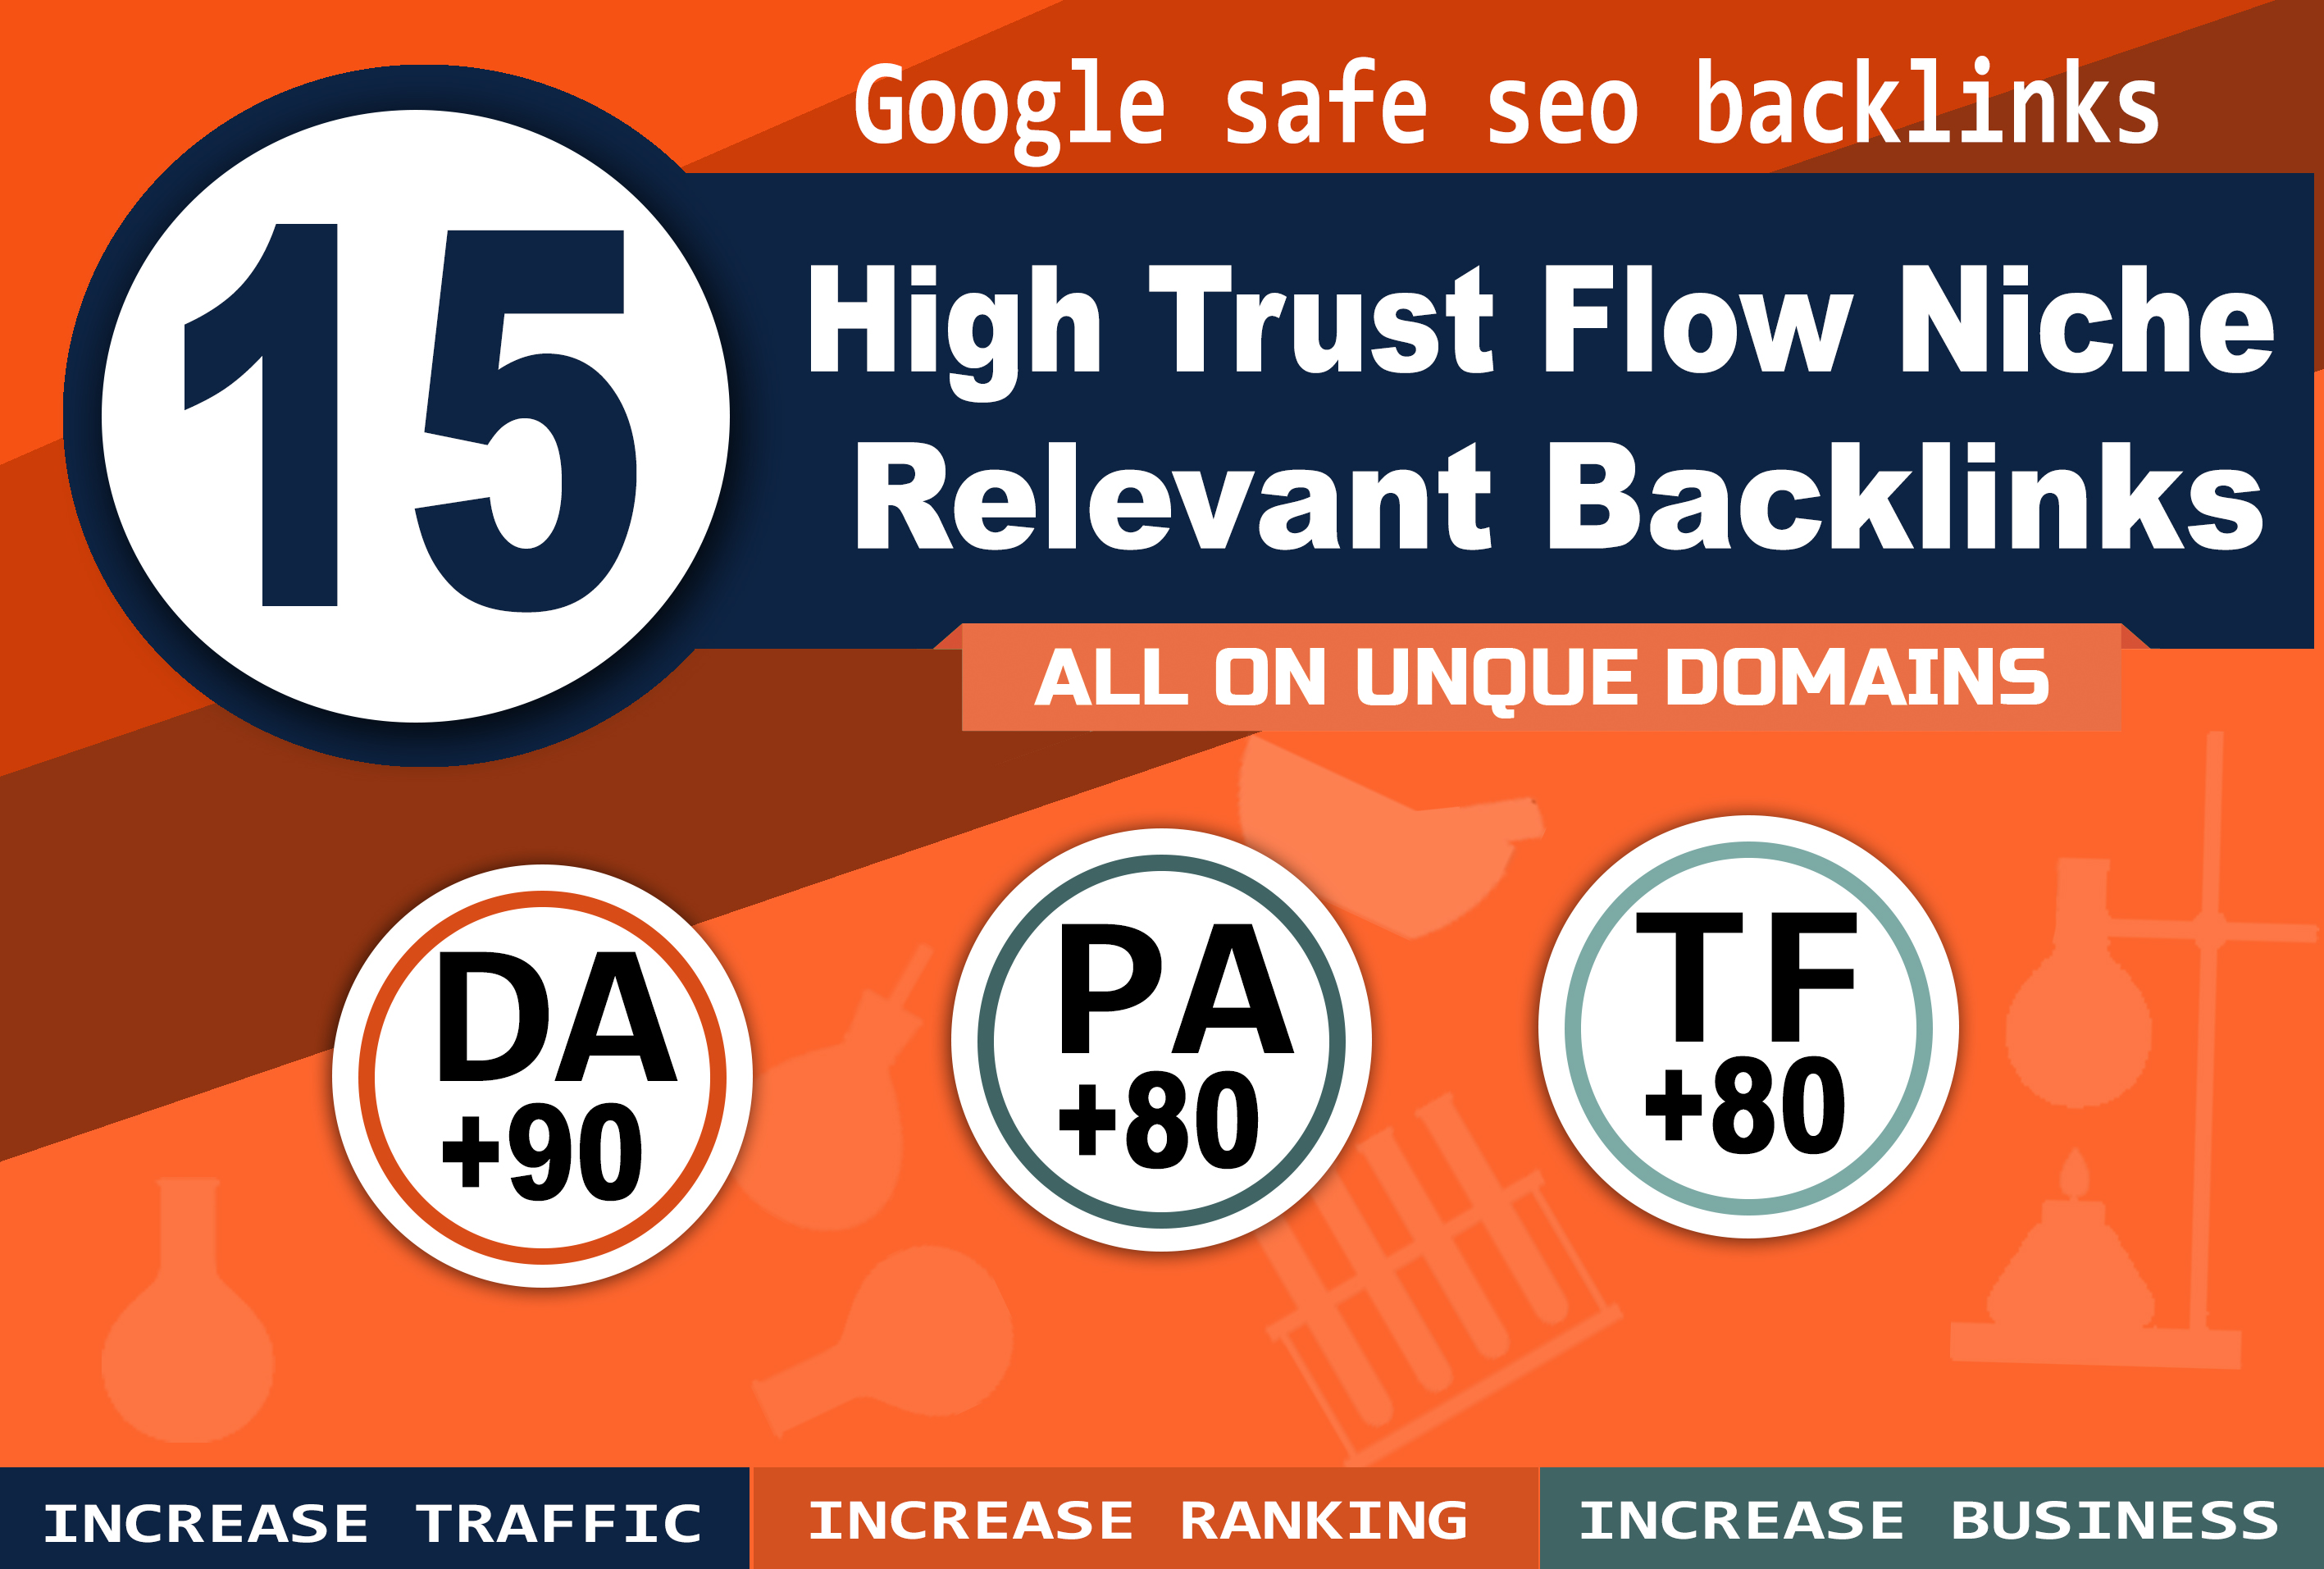 15 High Trust Flow Niche Relevant Backlinks